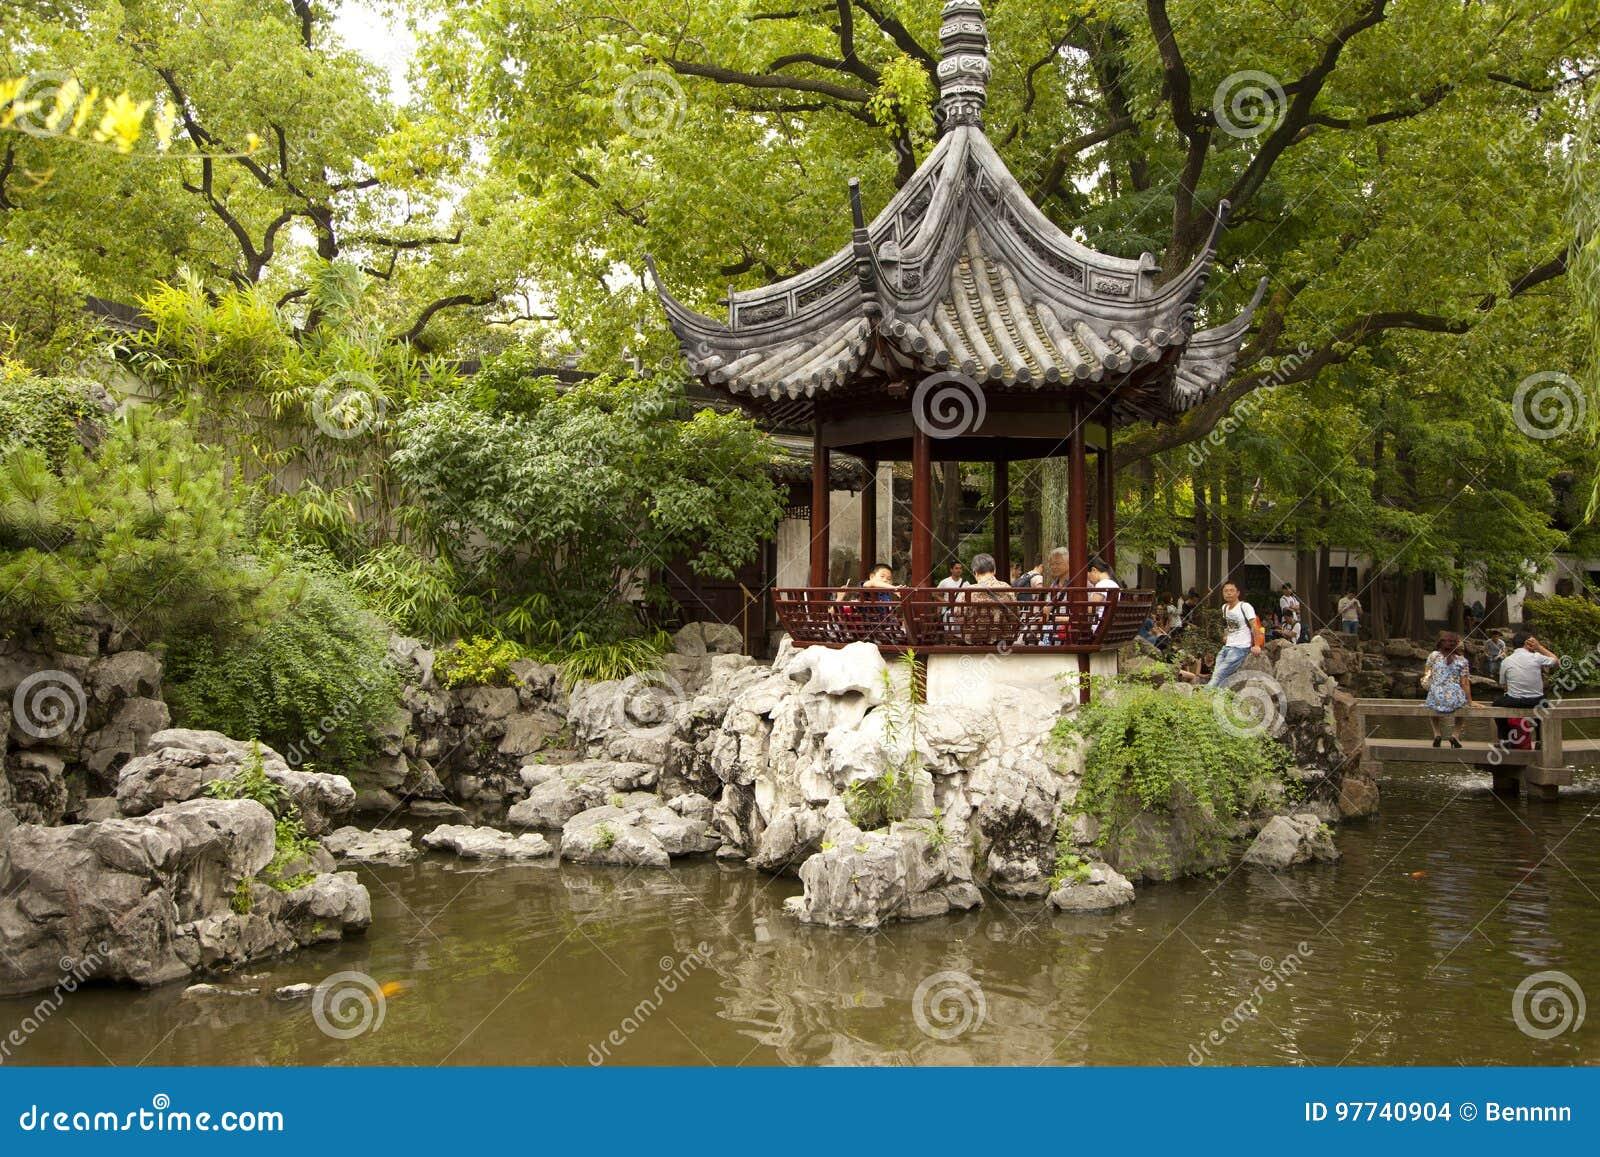 Yu Yuan Garden In Shanghai China Editorial Stock Image Image Of